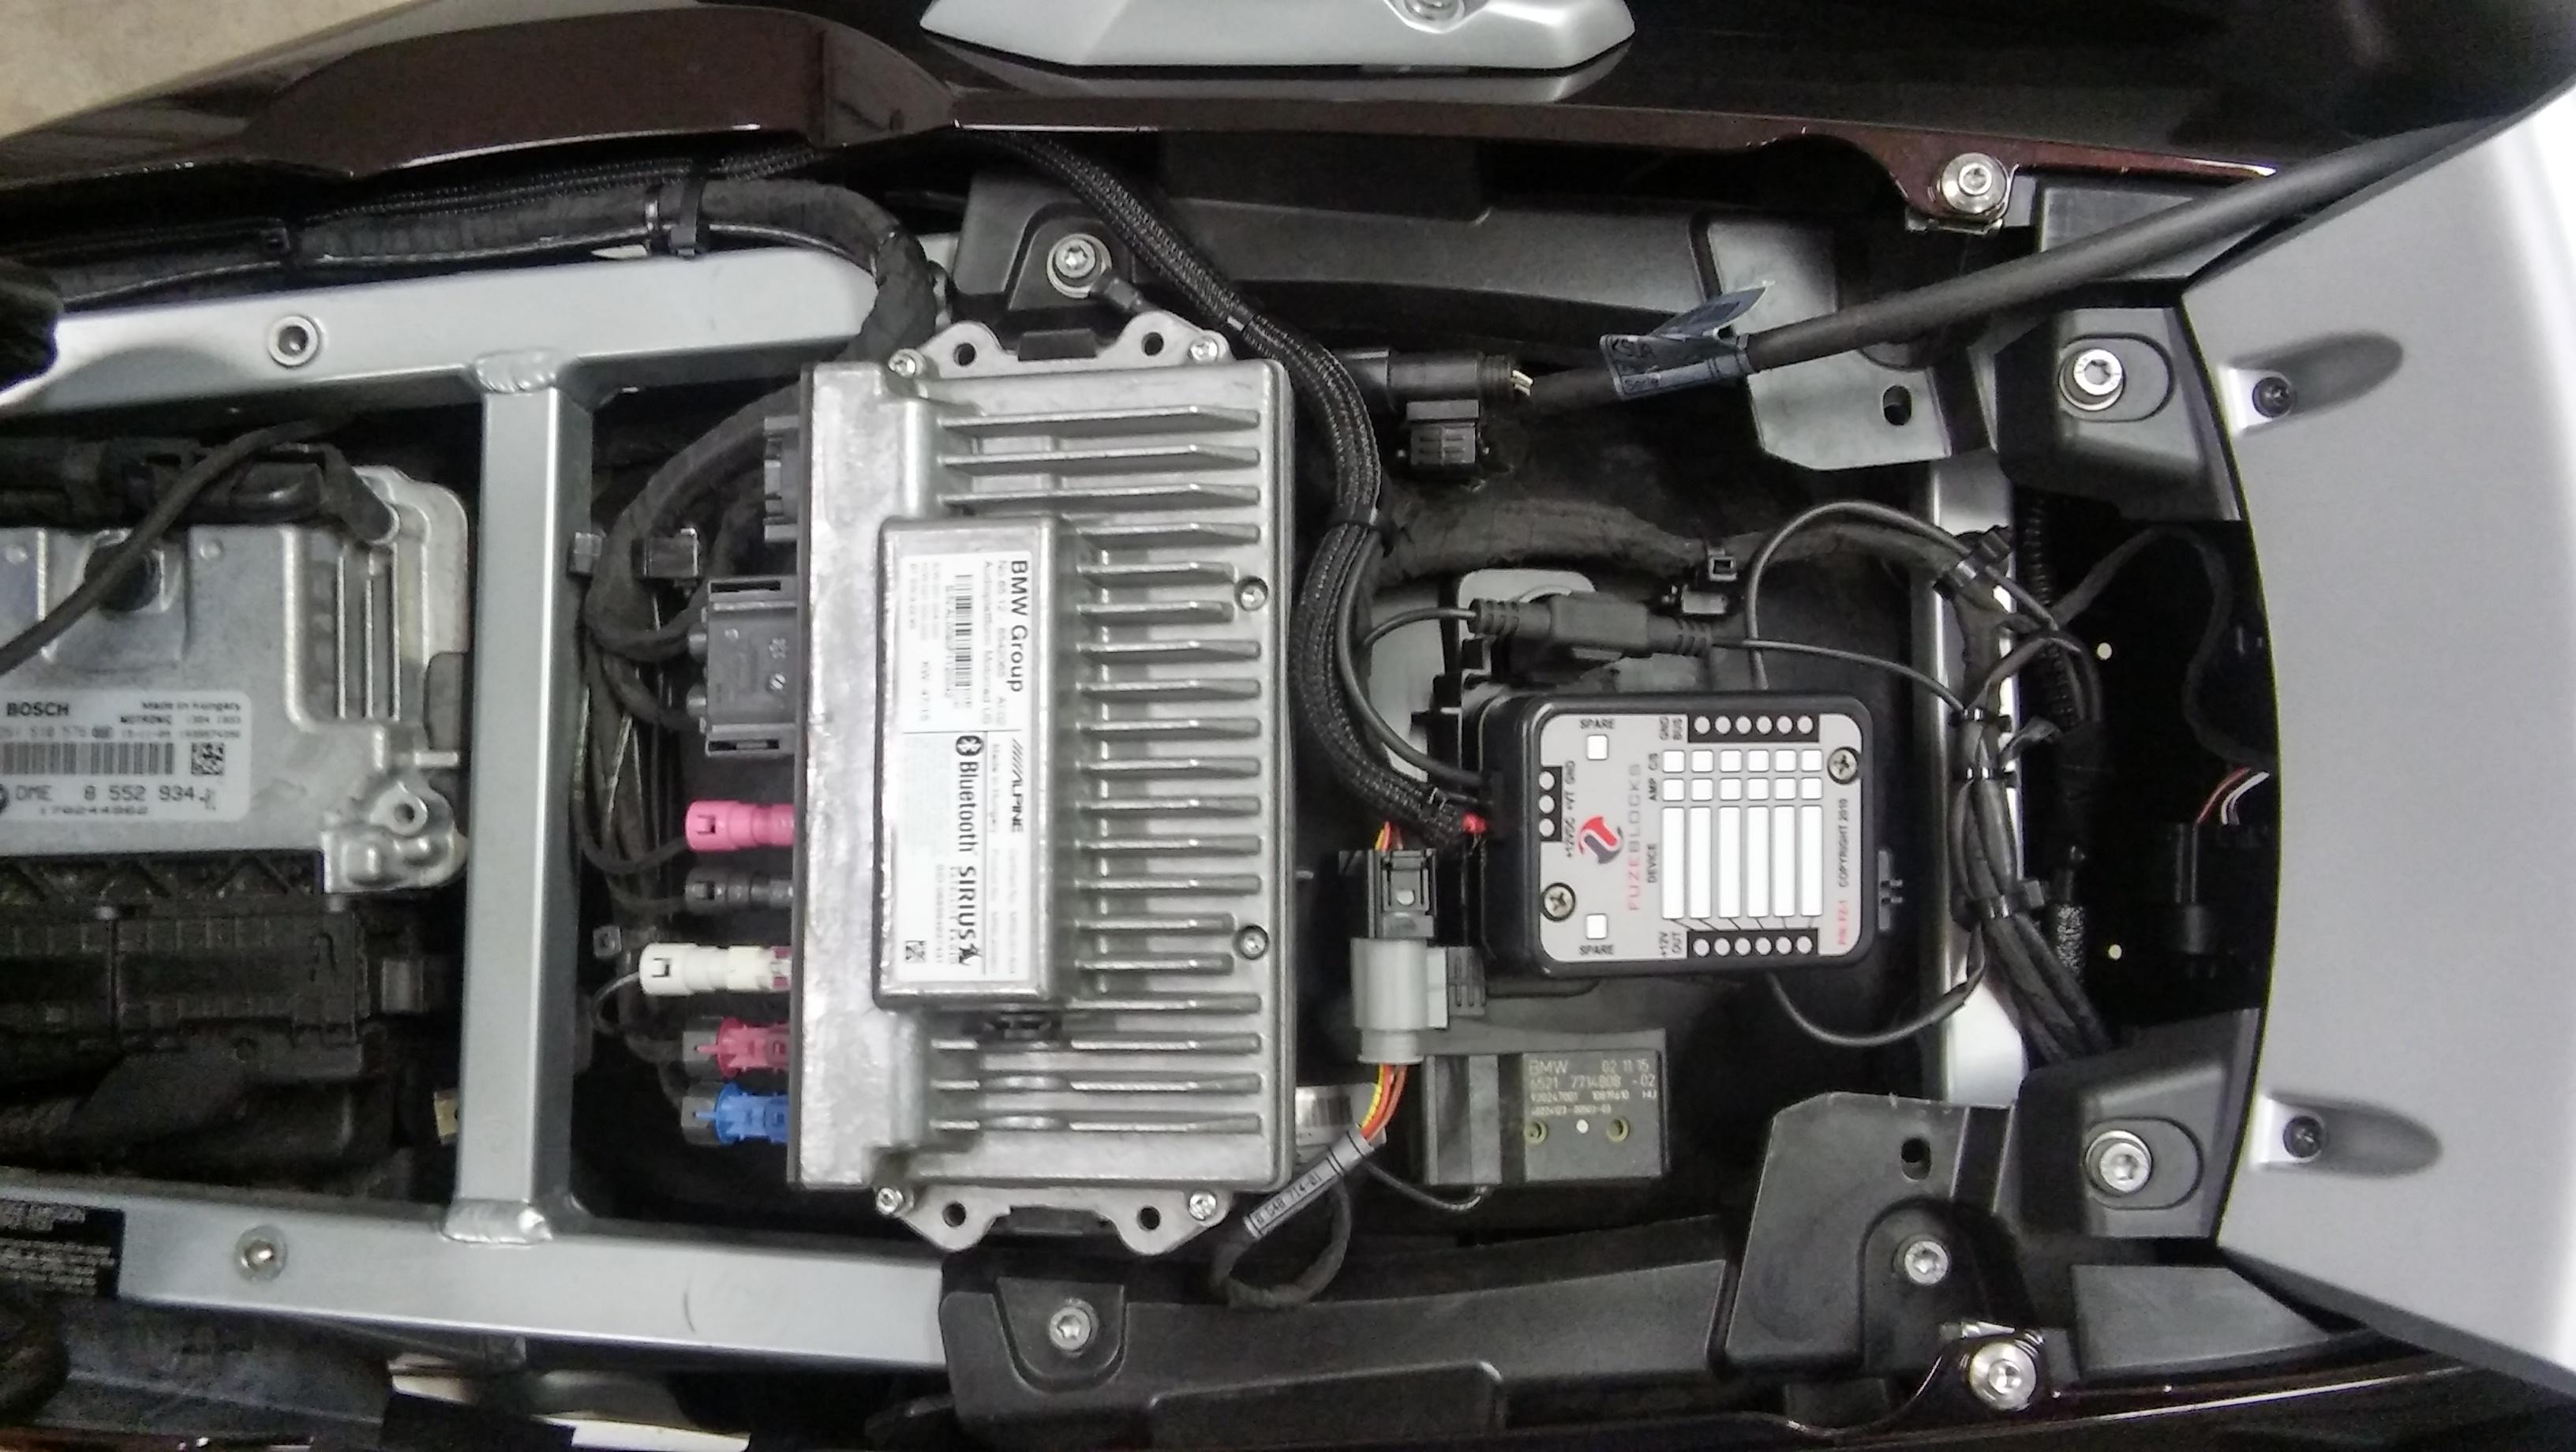 121217d1483398196 hyperlites vs bmw brake light 20161231_170539_hdr hyperlites bmw wiring diagrams wiring diagrams hyper lites wiring diagram at gsmx.co